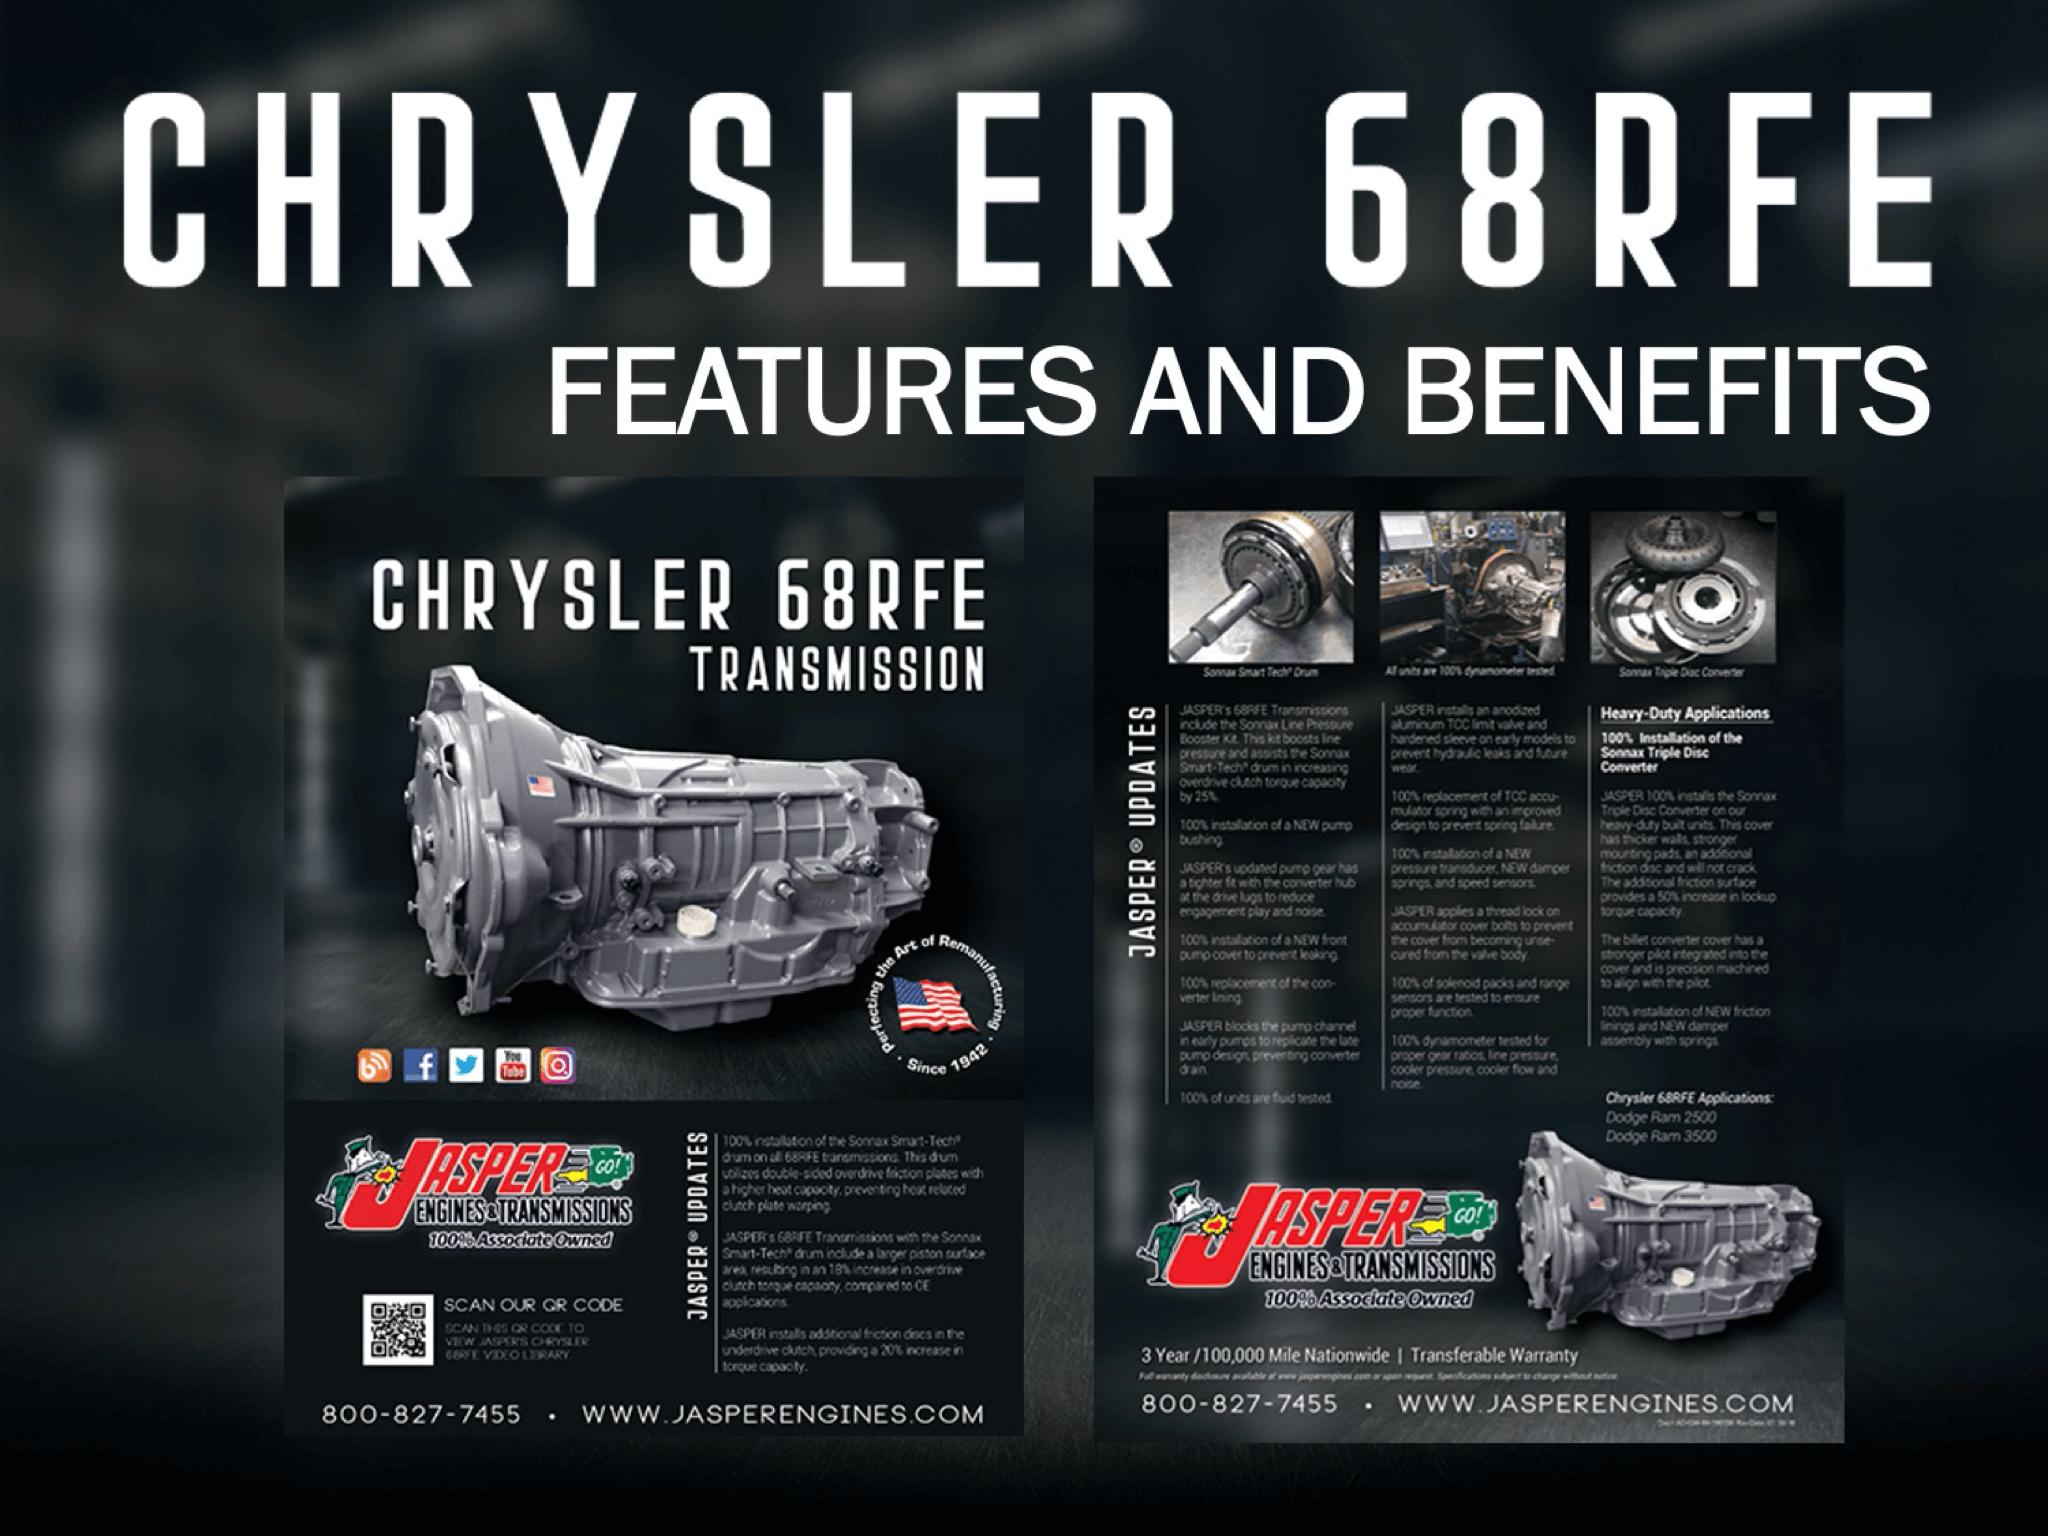 Chrysler 68 RFE Transmission